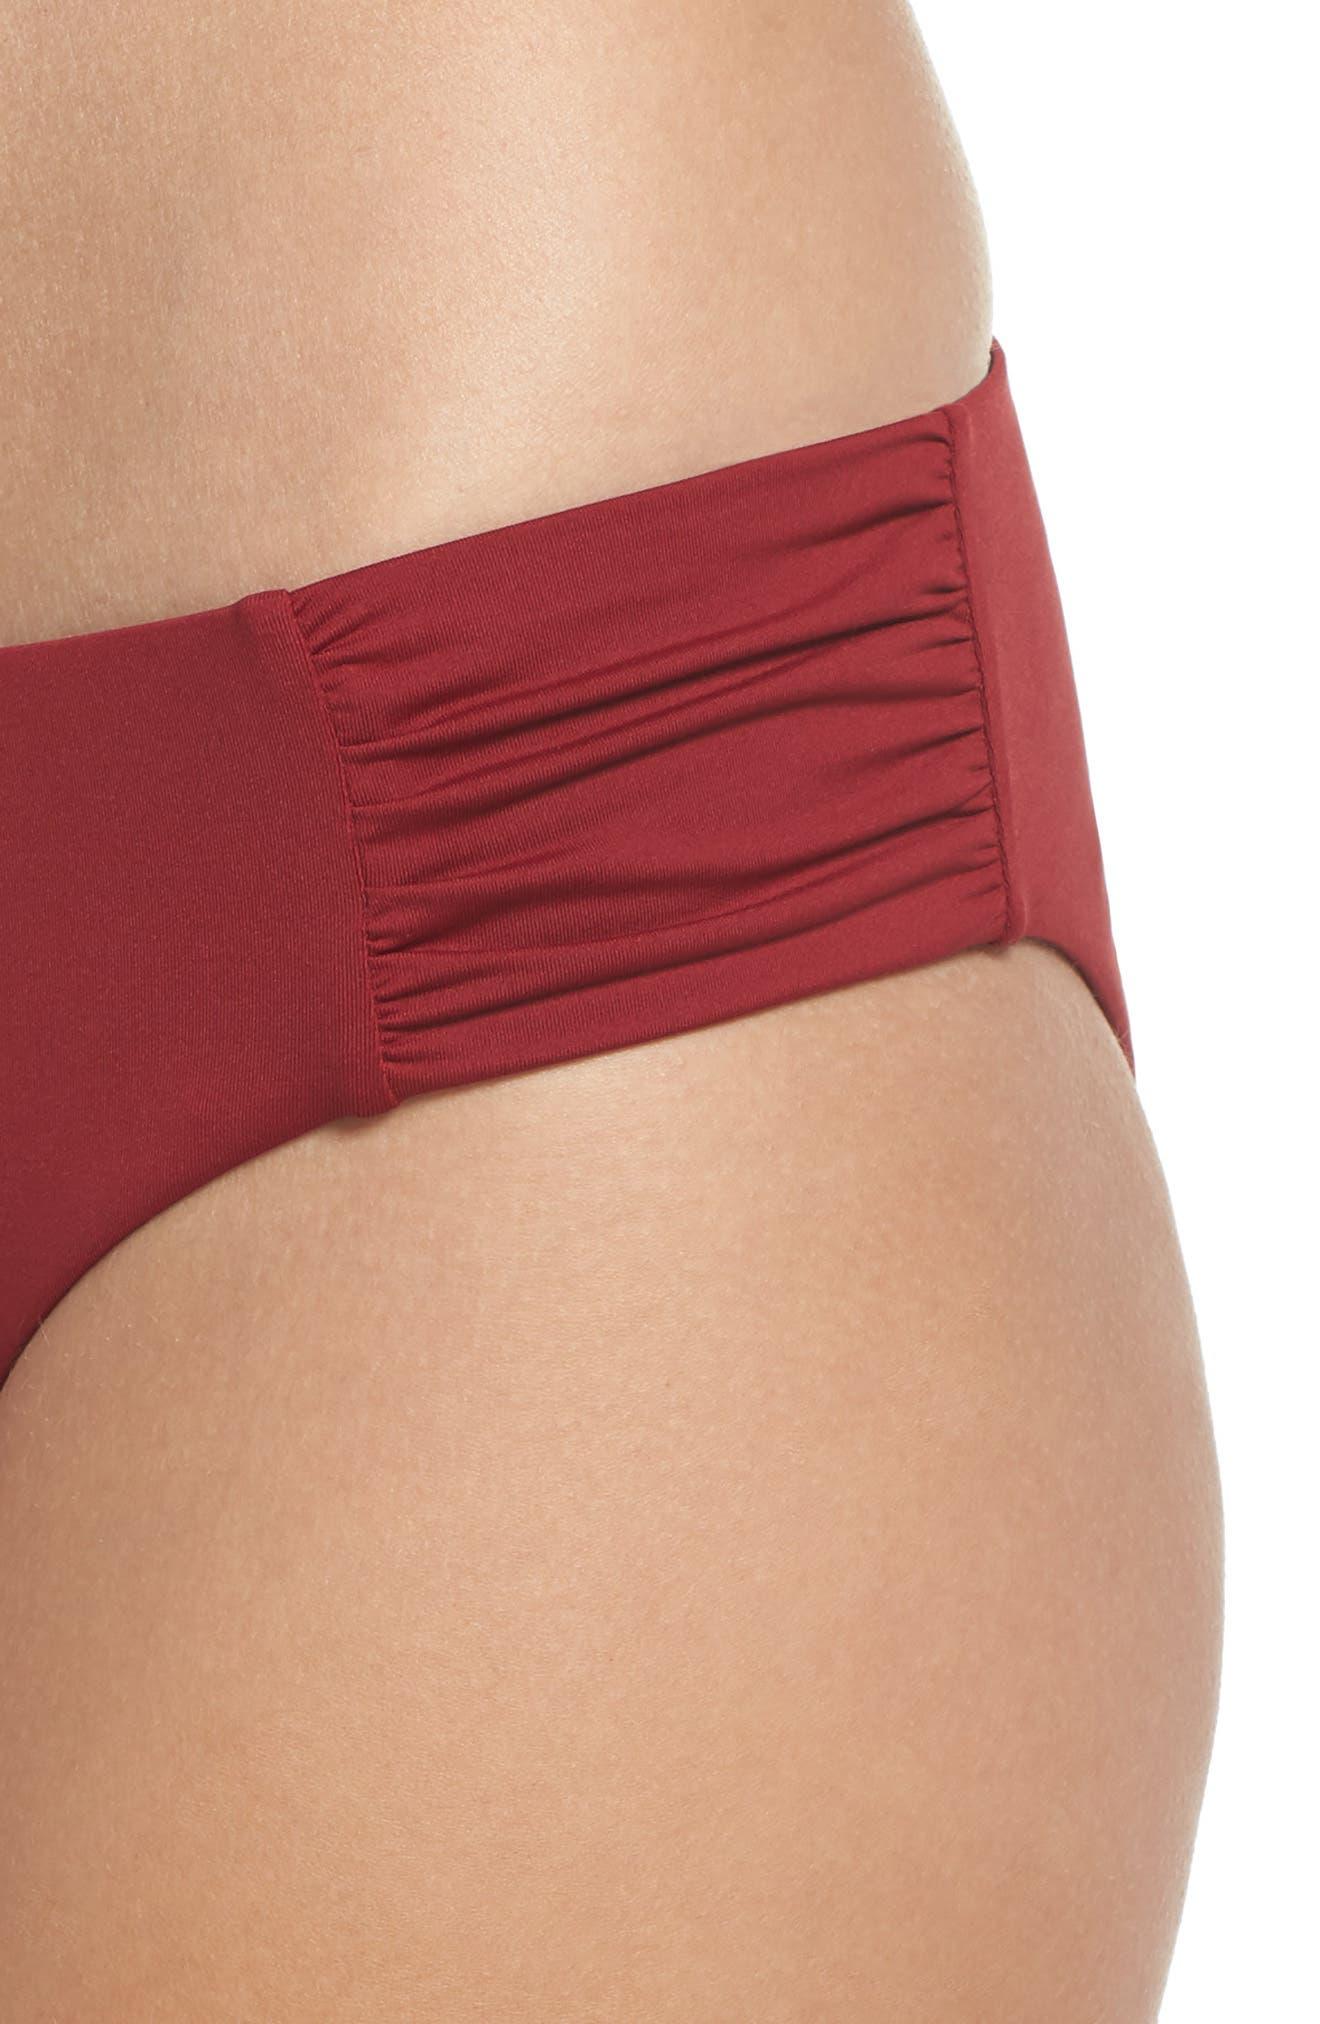 Sienna Reversible Hipster Bikini Bottoms,                             Alternate thumbnail 5, color,                             RED RUMBA